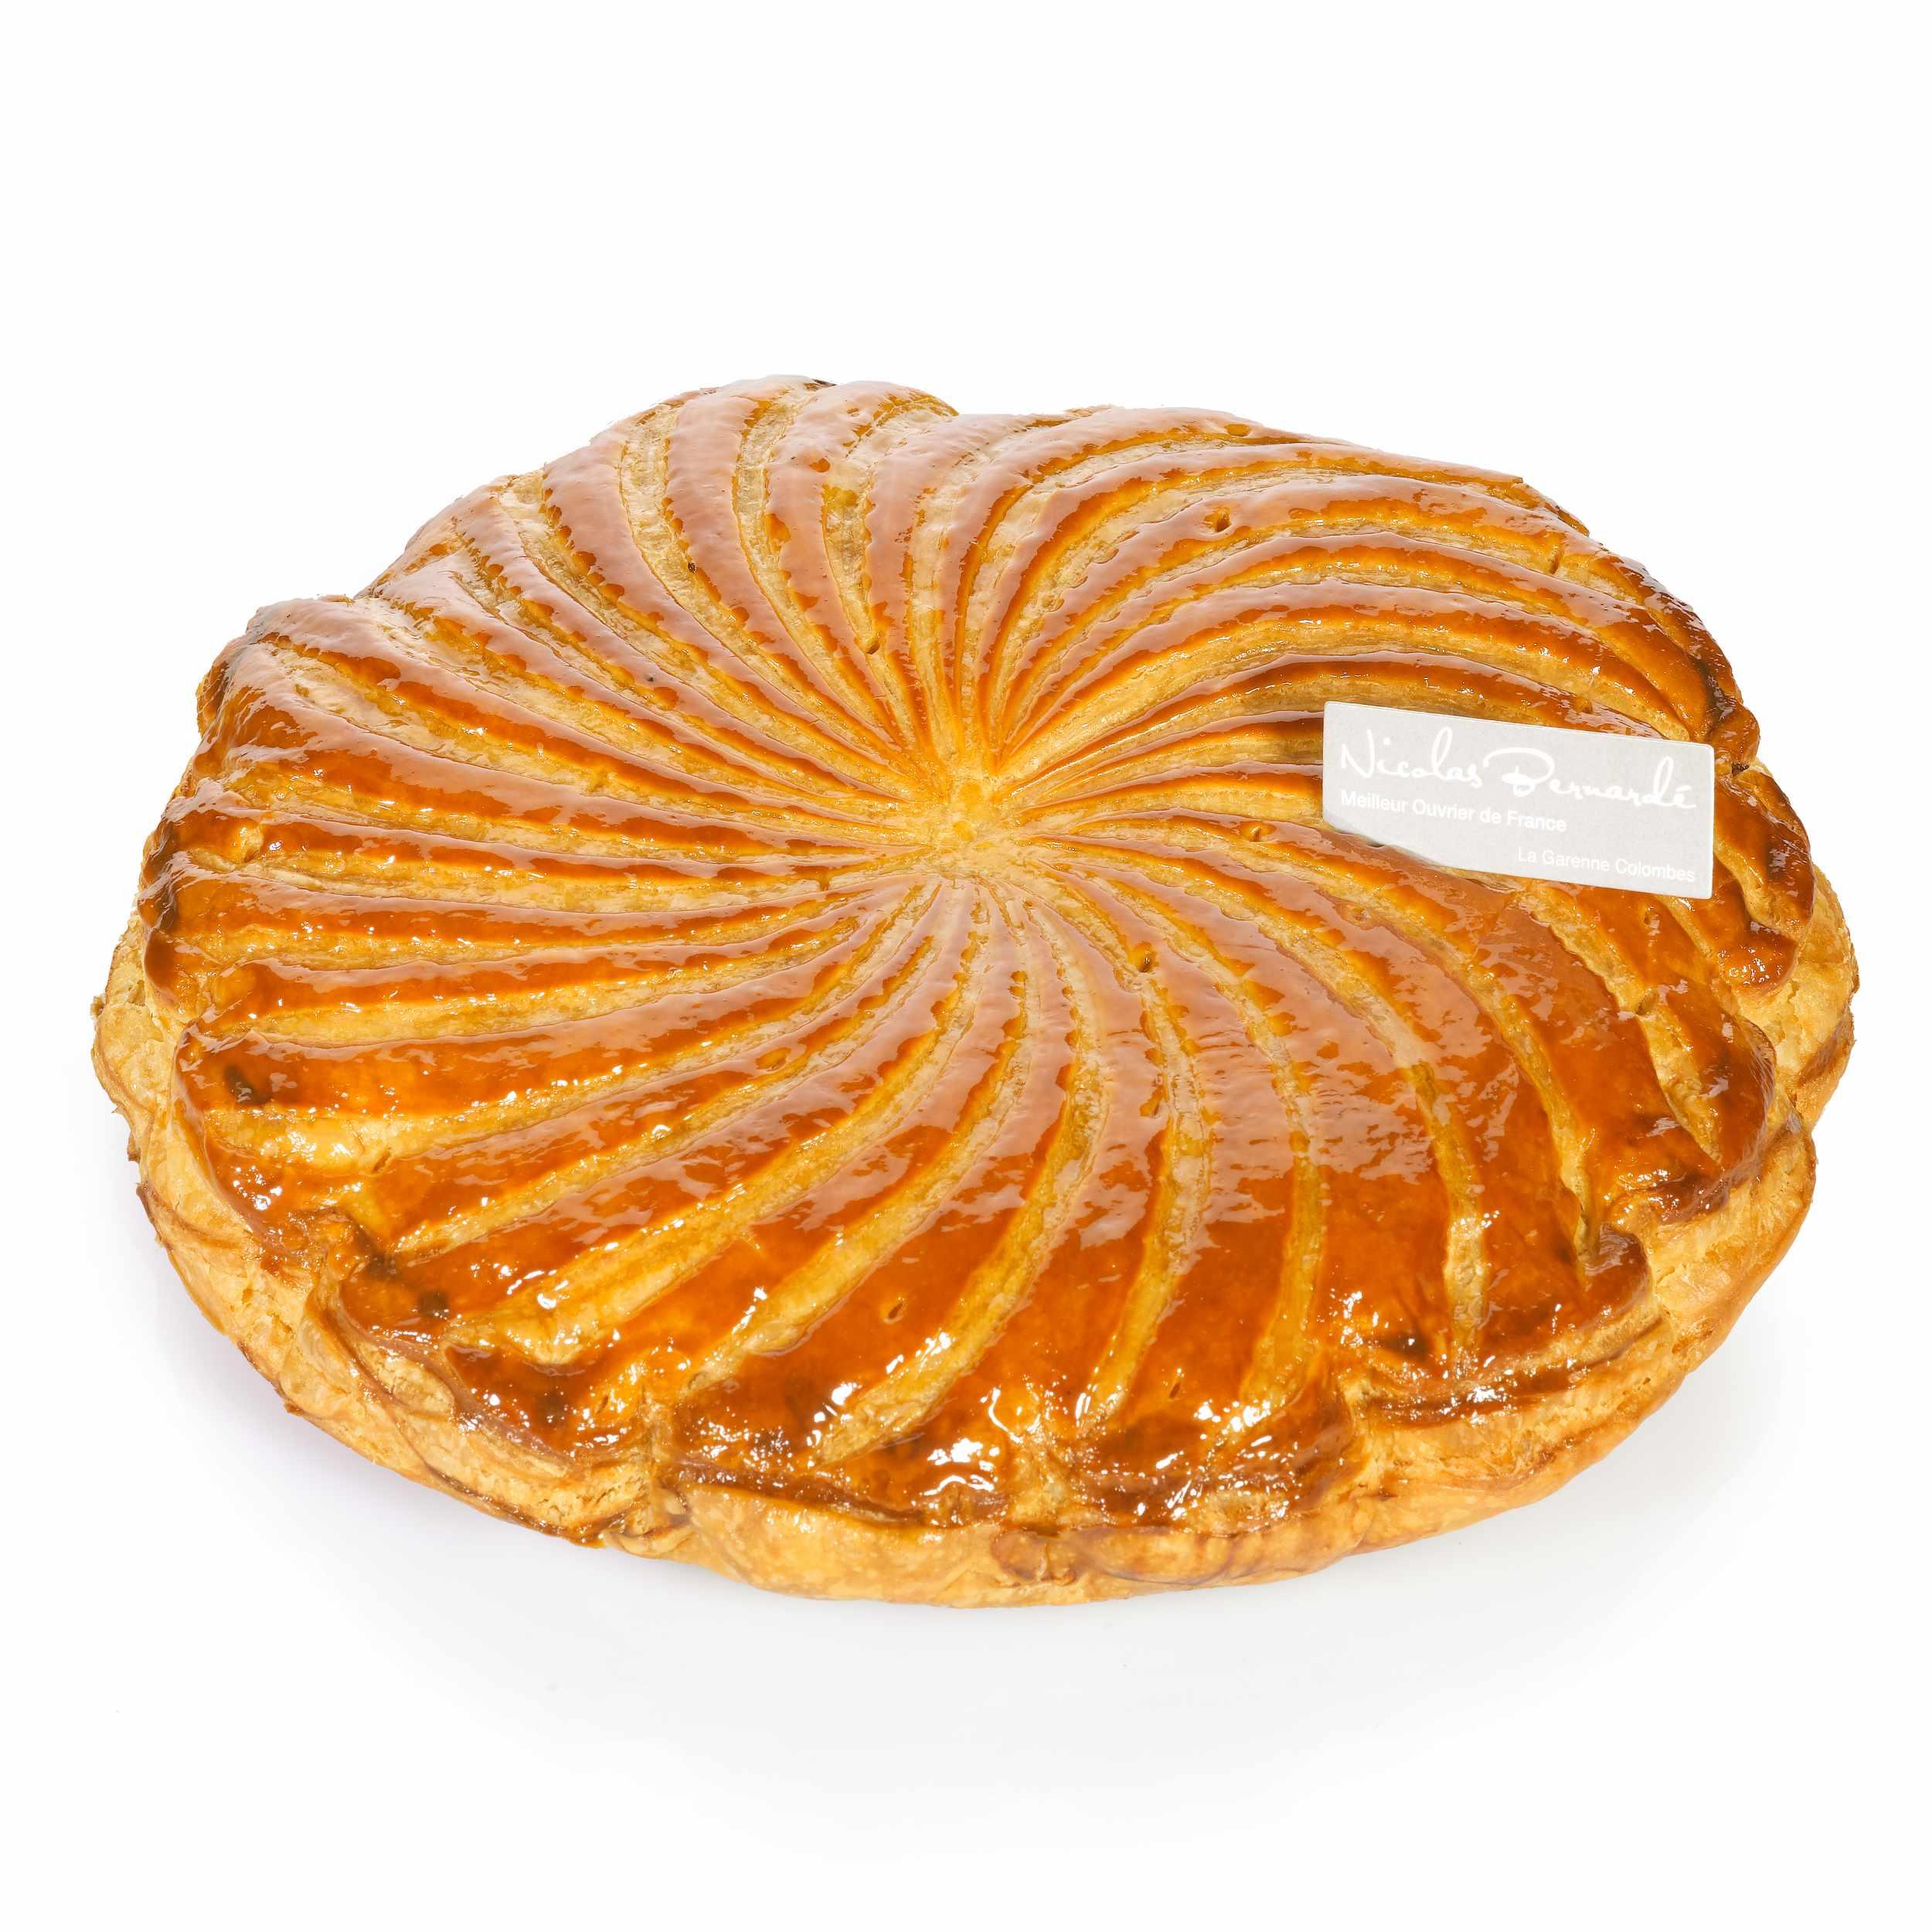 galette-roi-amande.jpg